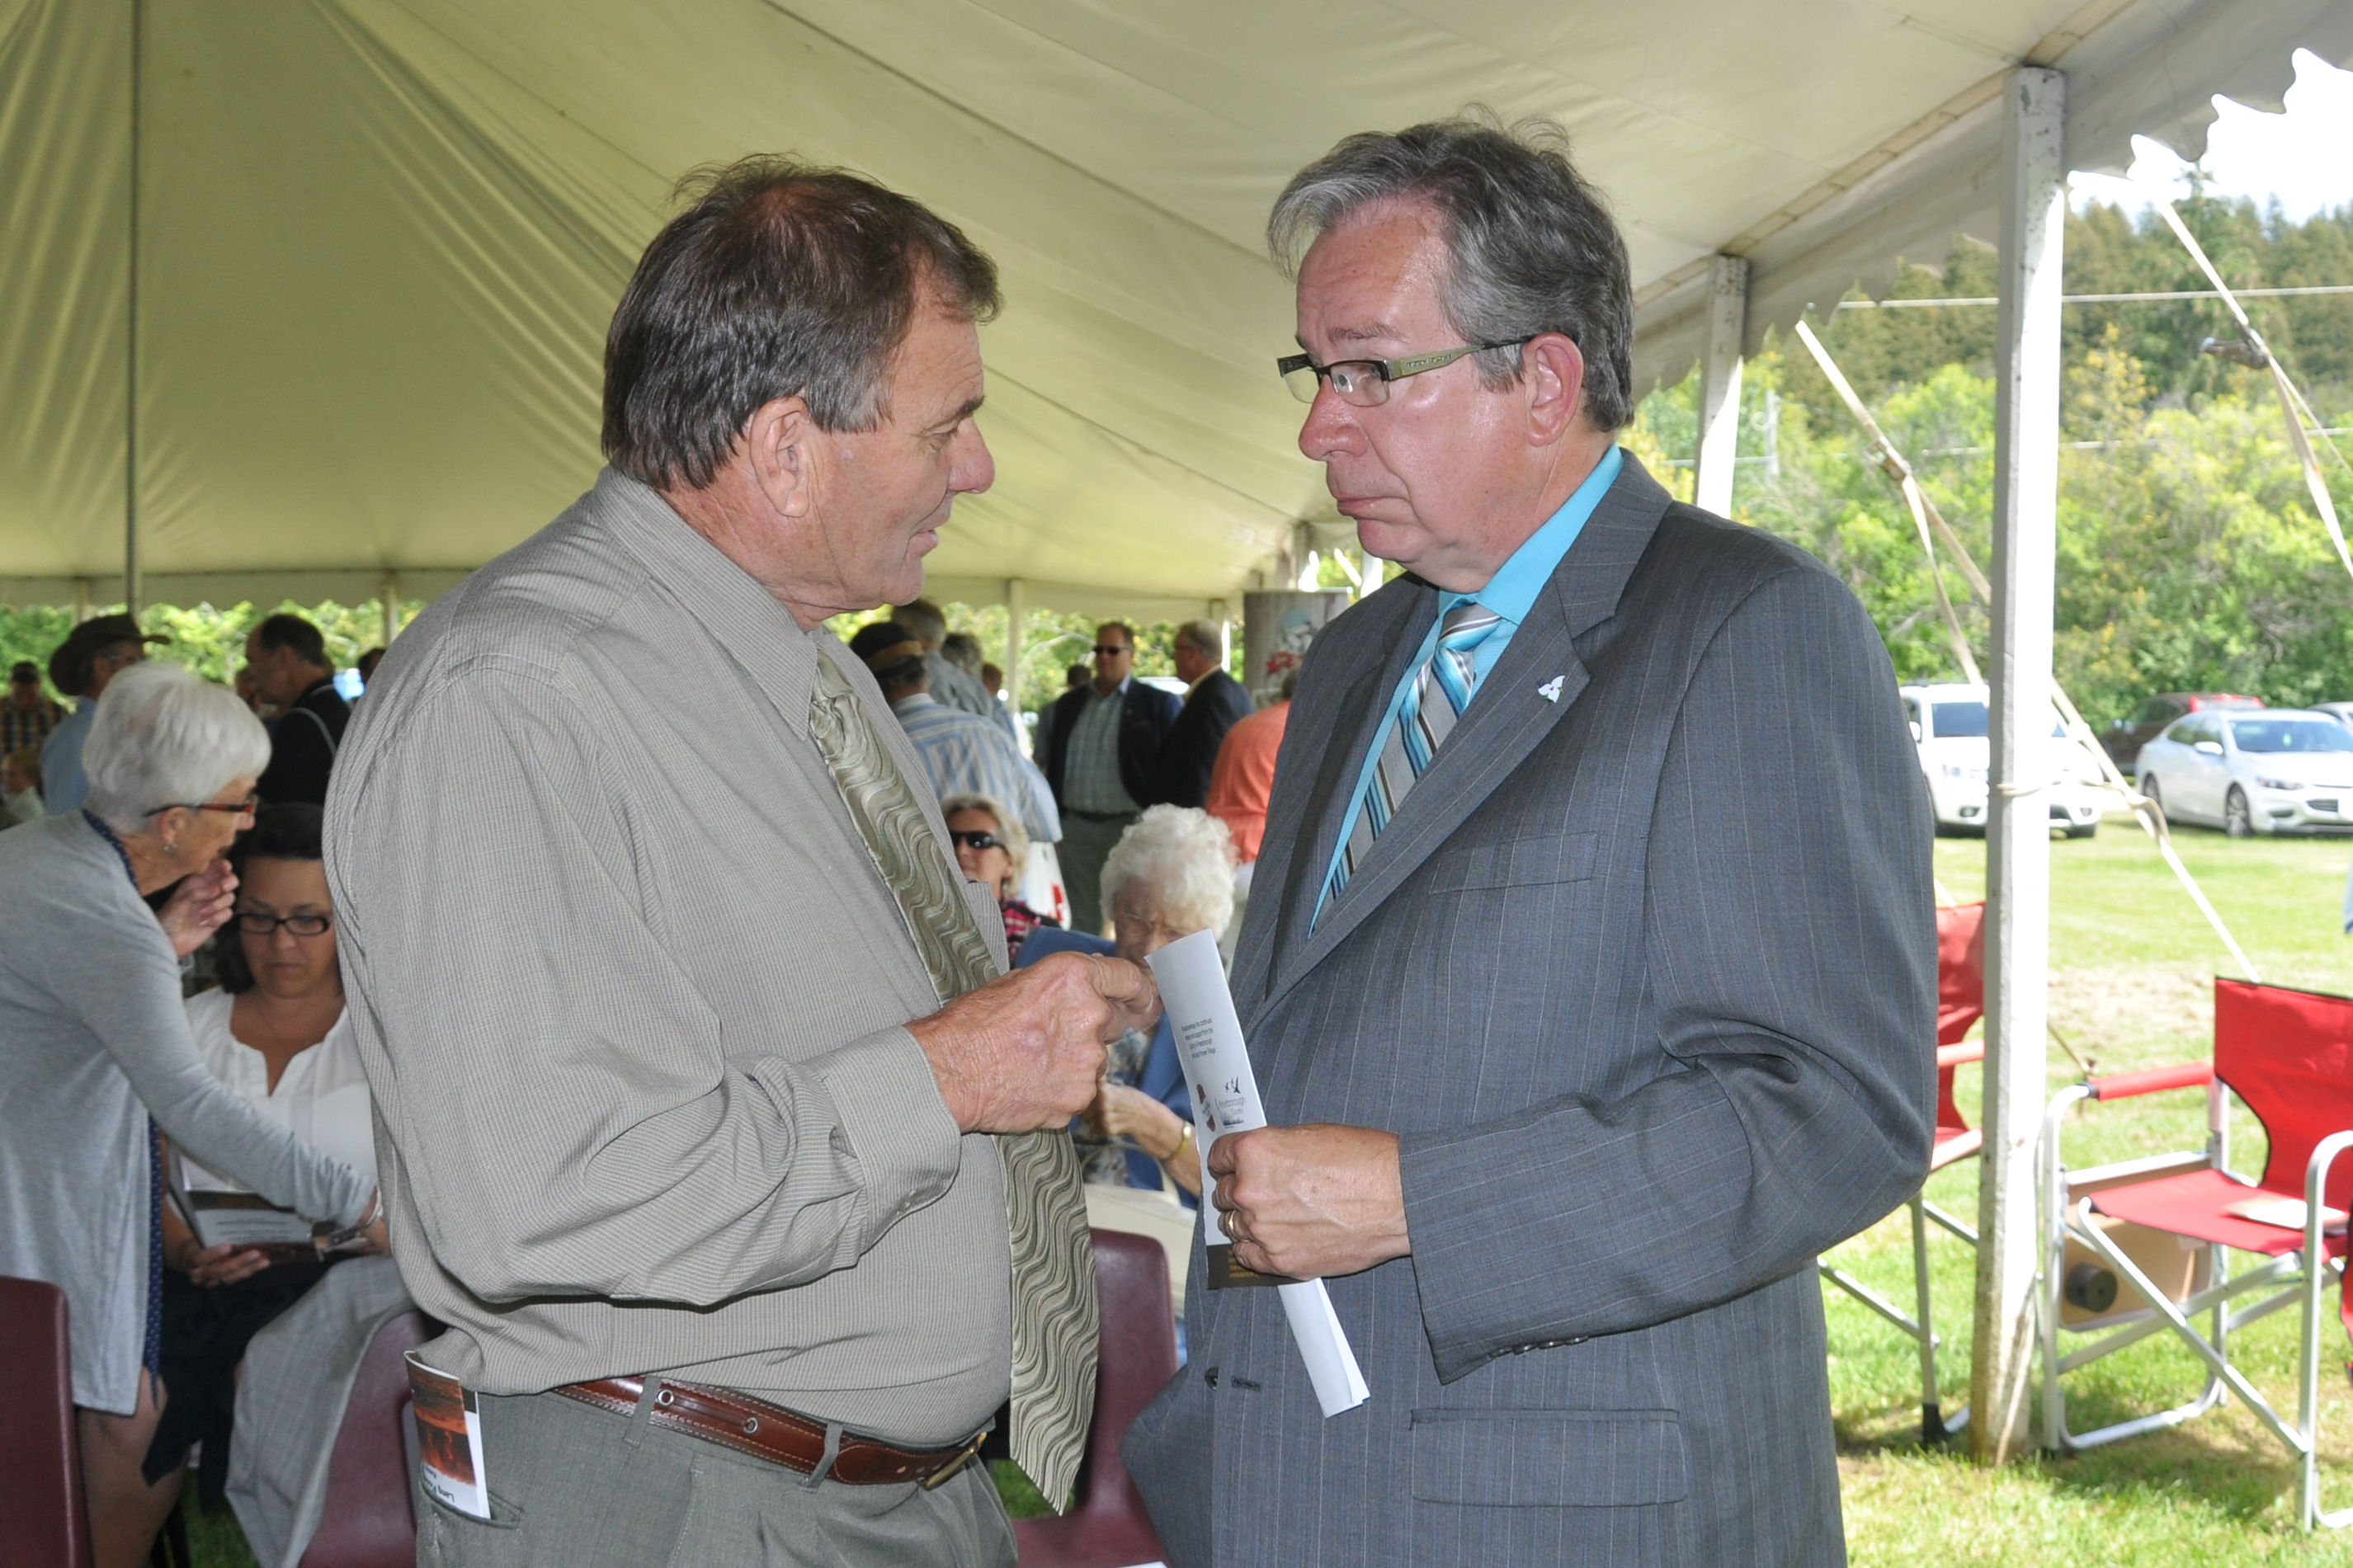 Jim Glenn and Jeff Leal MPP